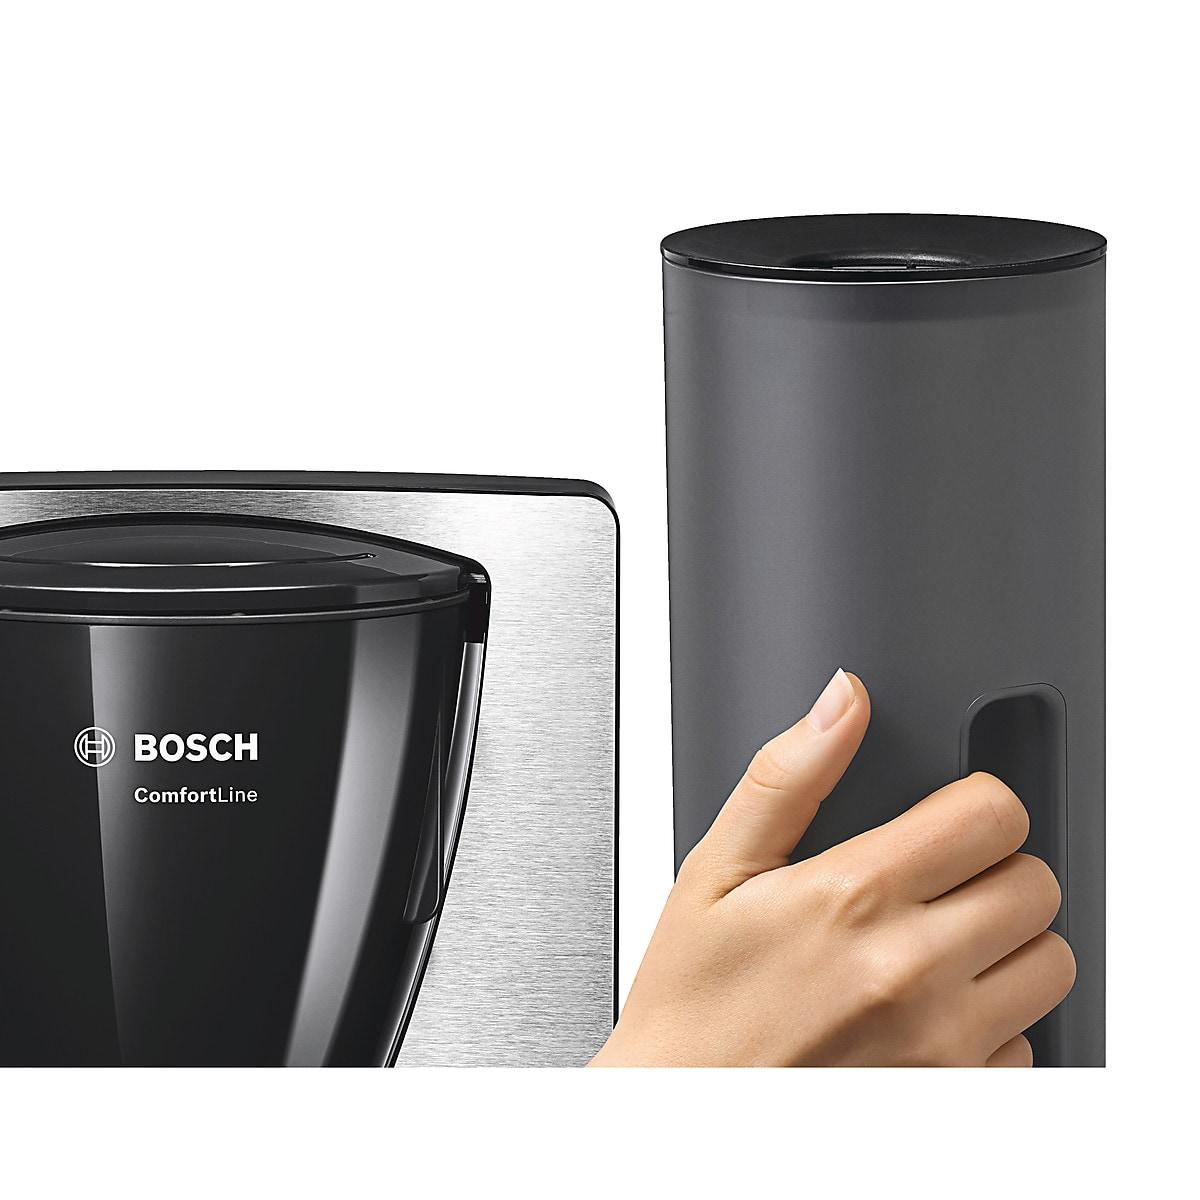 Kaffebryggare Bosch ComfortLine TKA6A643